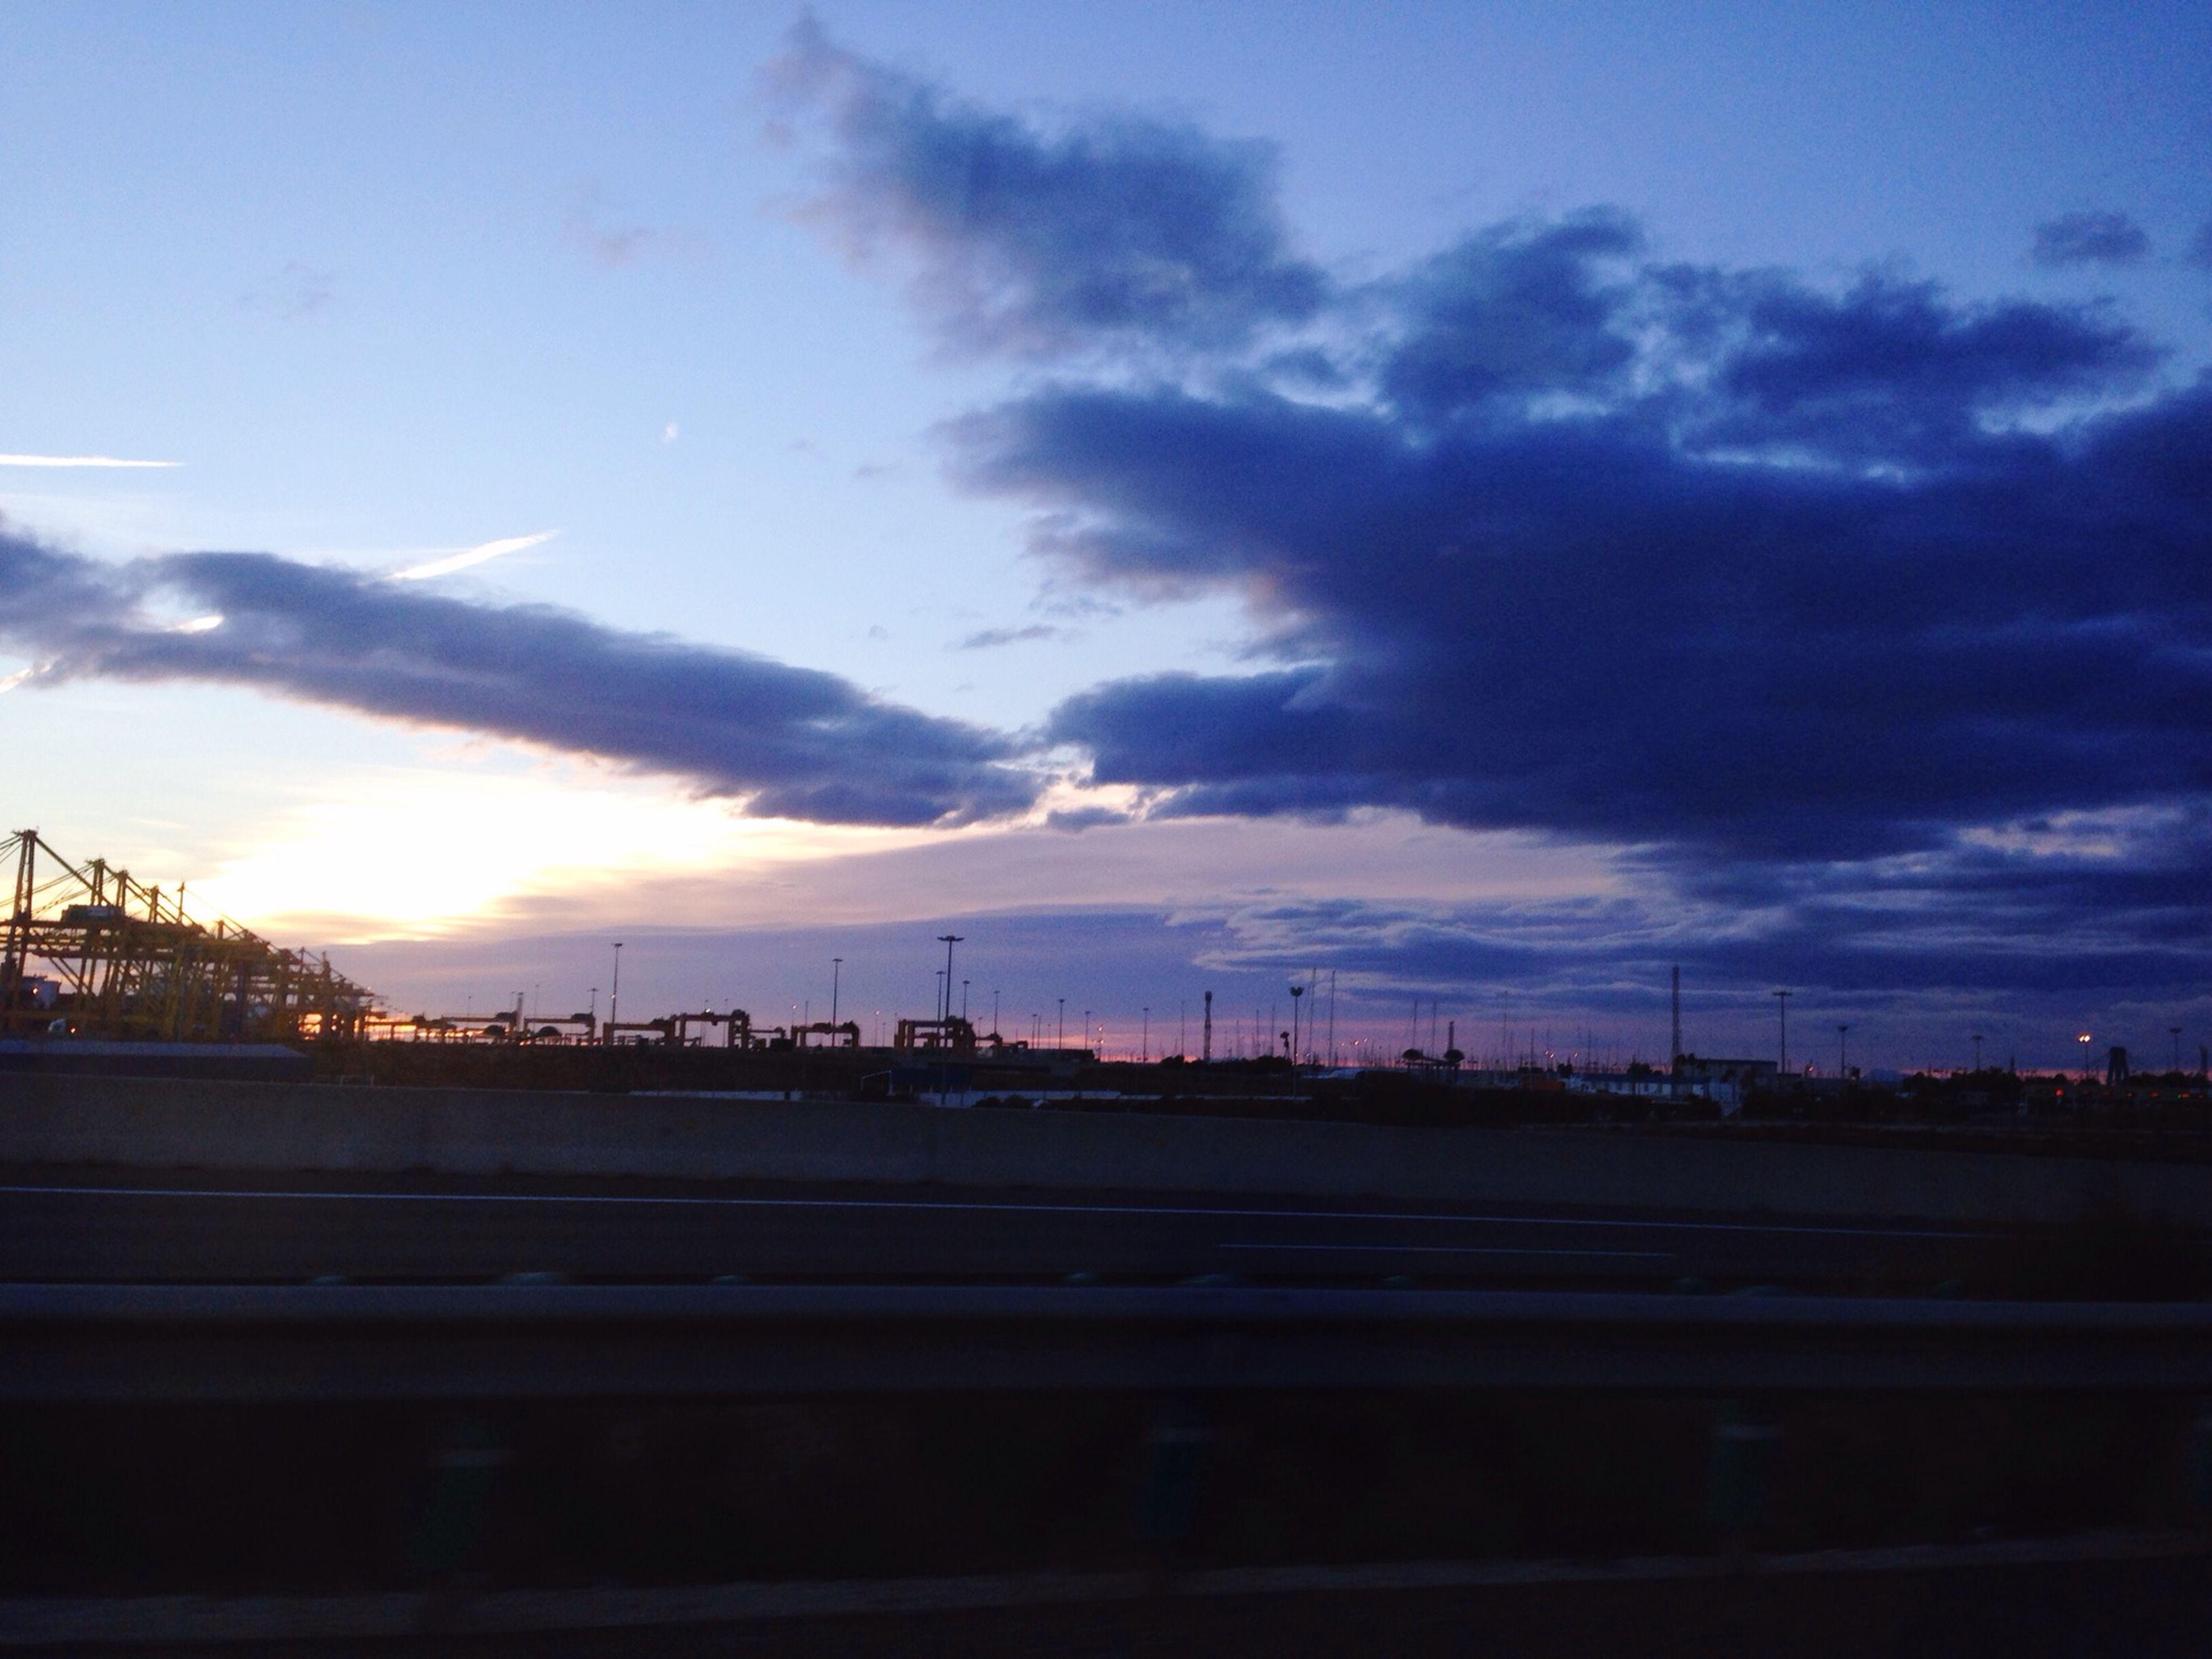 sky, cloud - sky, building exterior, built structure, architecture, city, sunset, dusk, silhouette, cloudy, cloud, railroad track, transportation, connection, railing, crane - construction machinery, outdoors, no people, blue, rail transportation